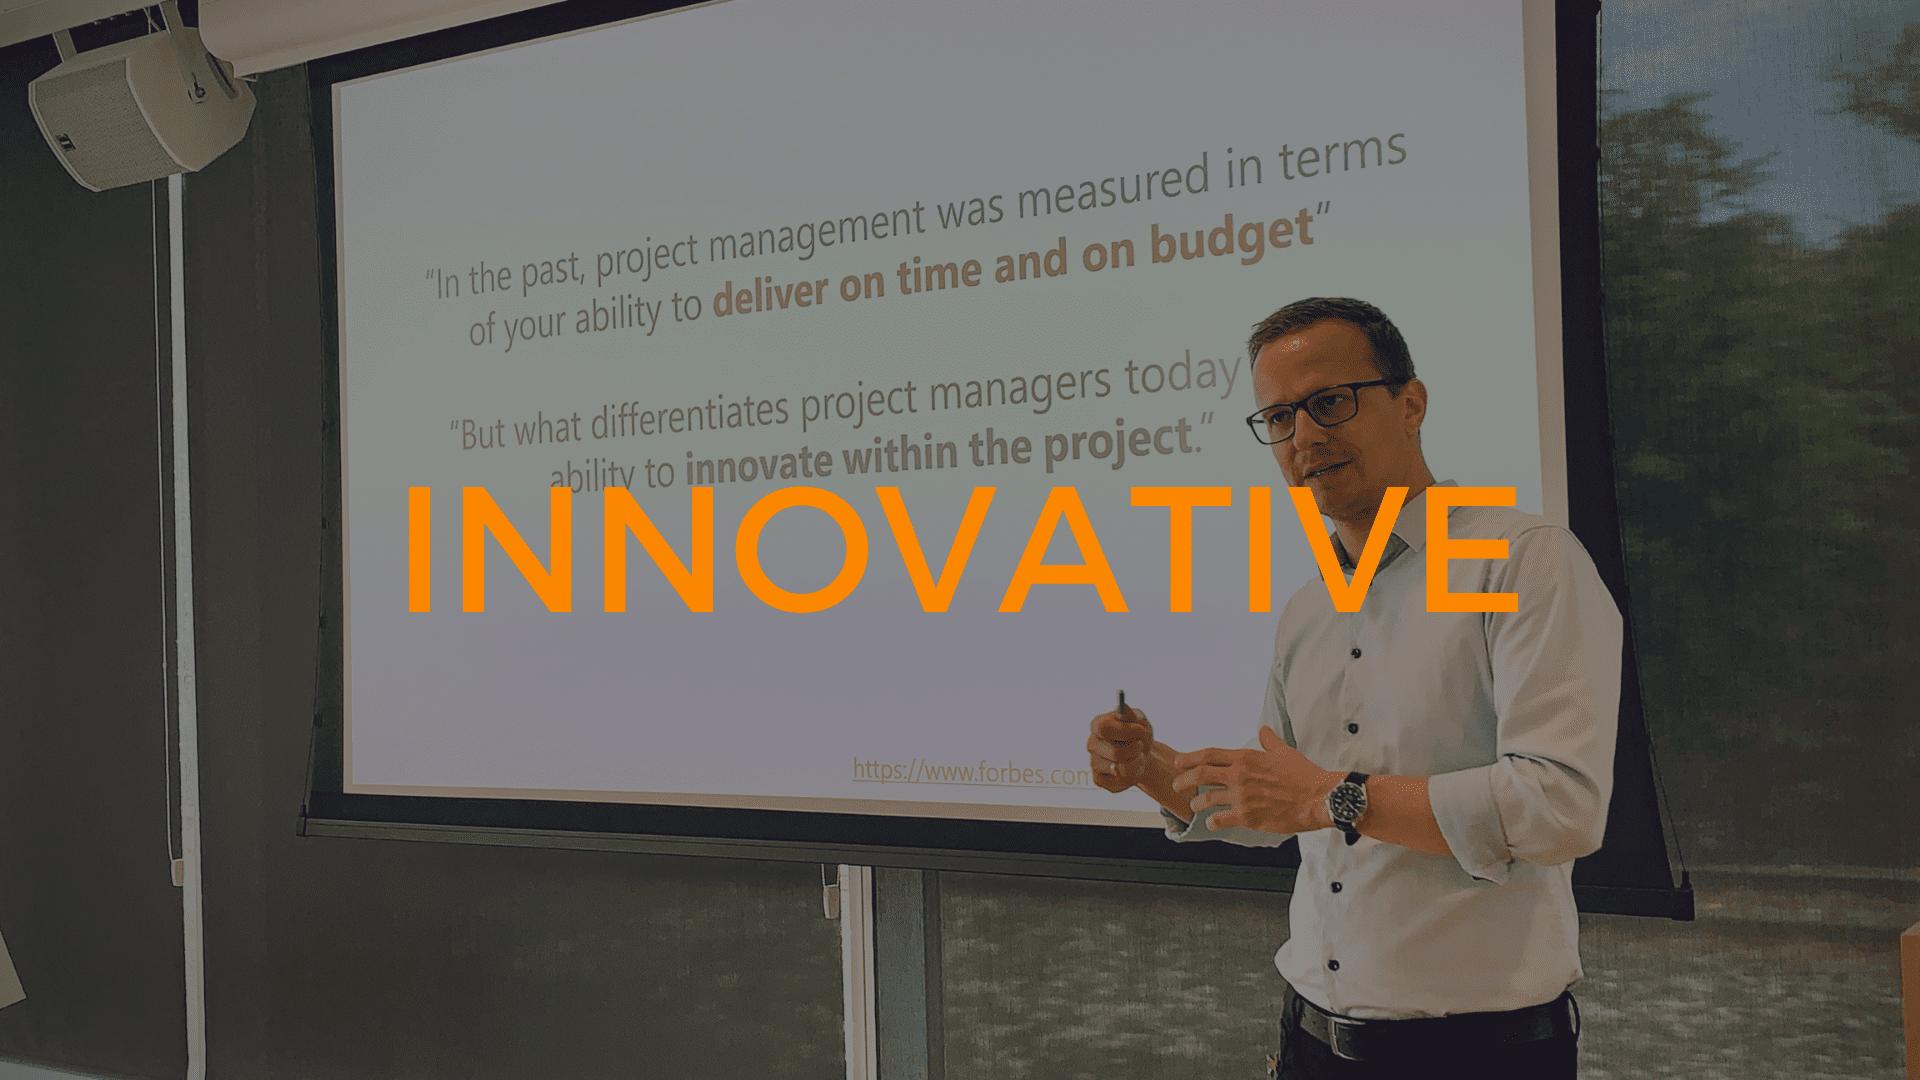 Projectum value innovative